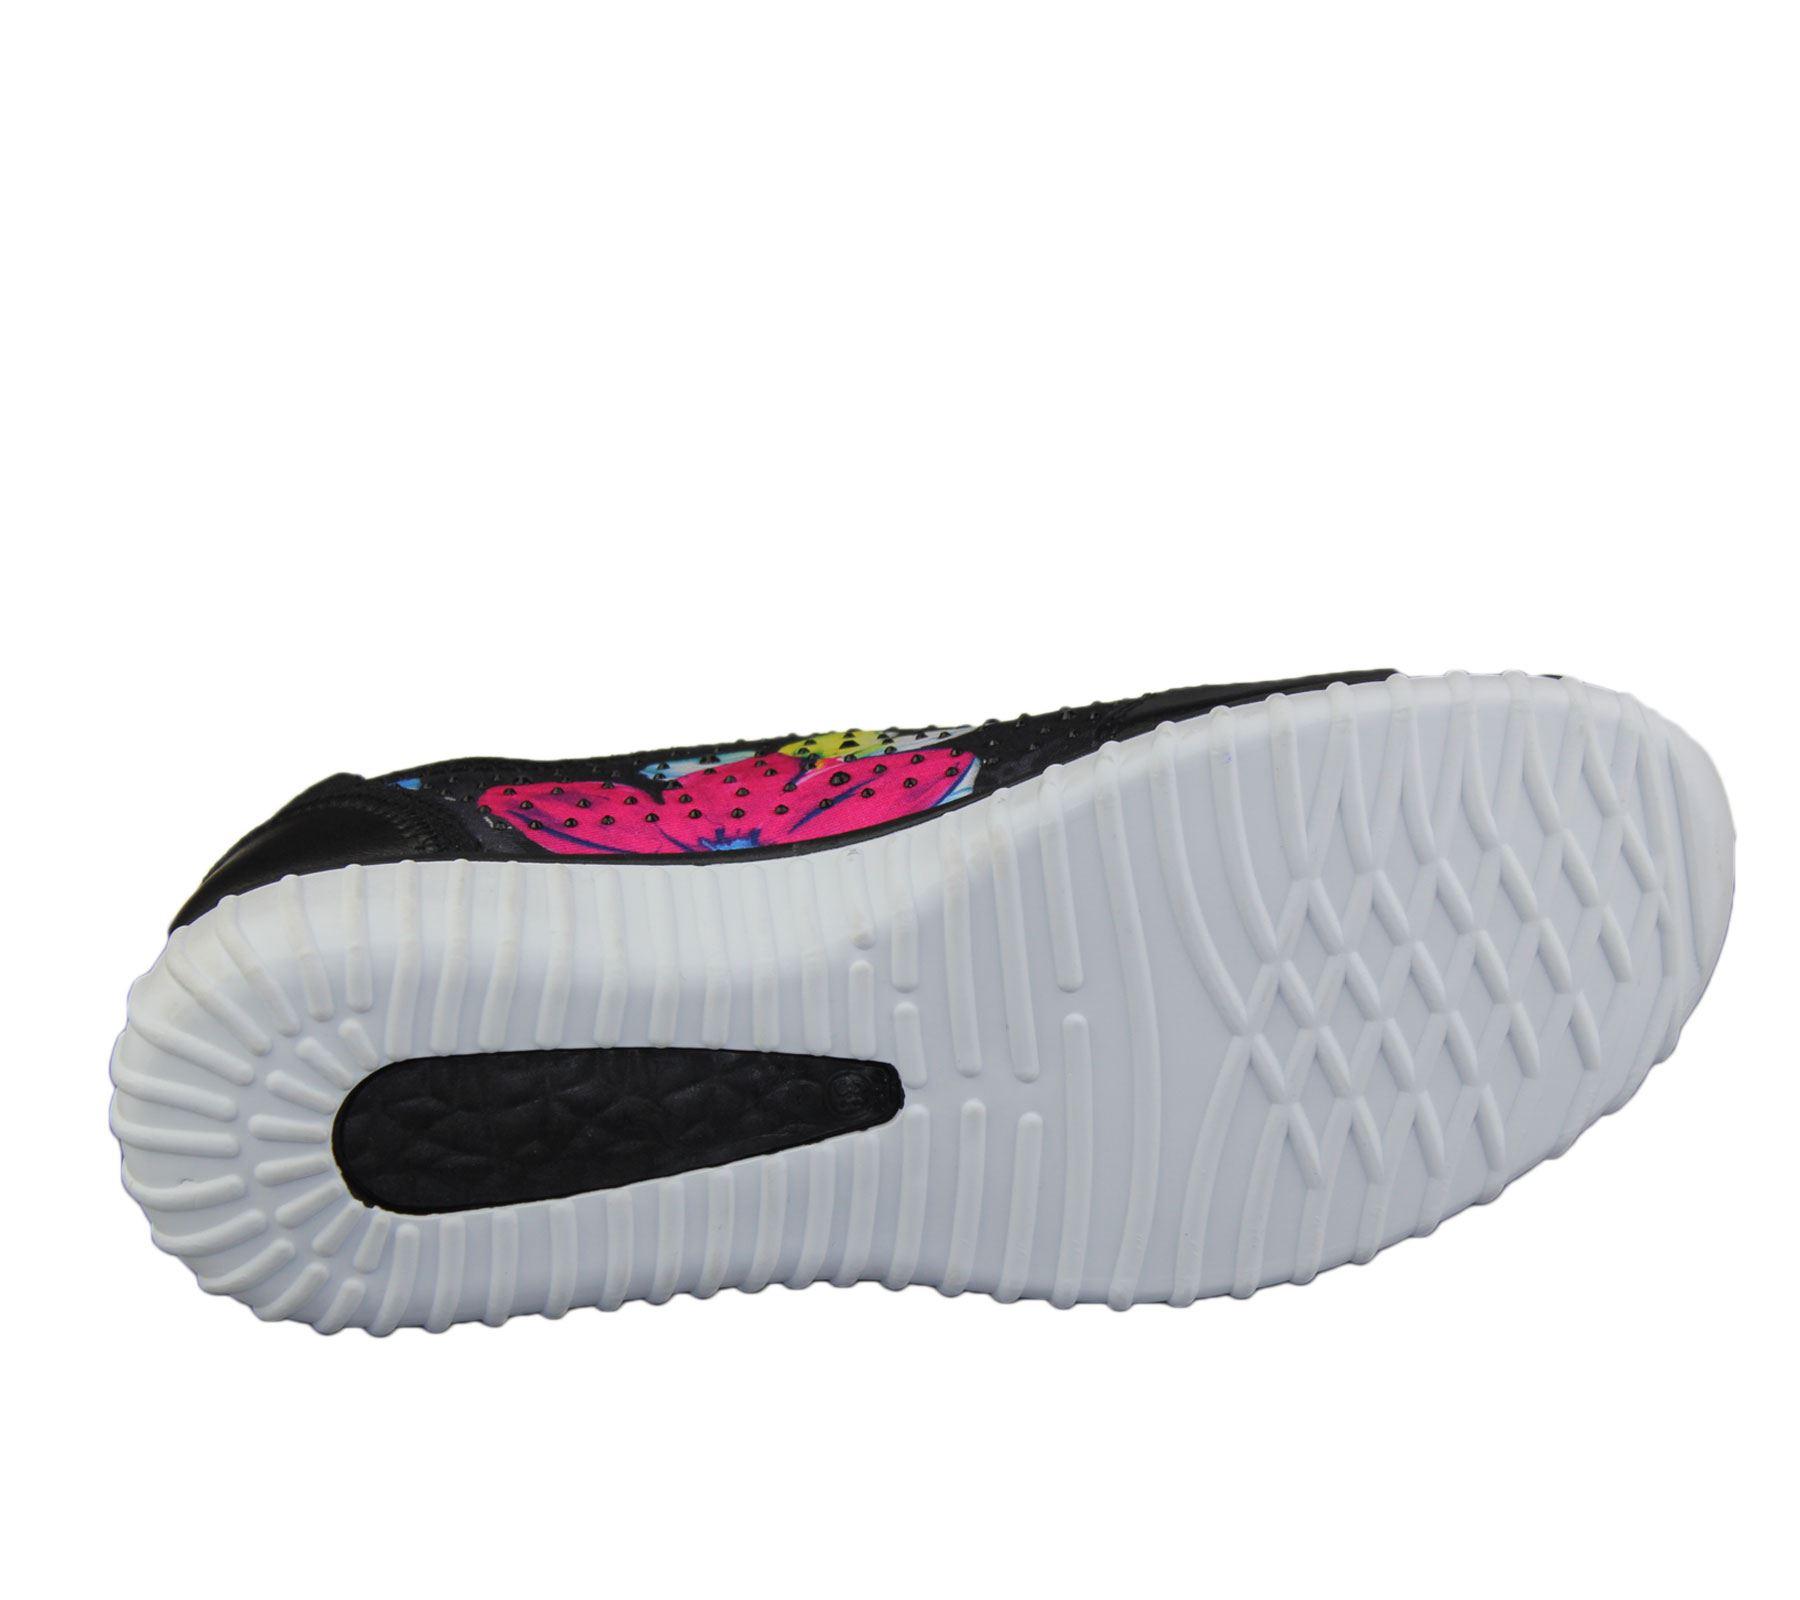 Womens-Trainer-Ladies-Comfort-Walking-Fashion-Summer-Gym-Sport-Flat-Shoes-Size thumbnail 6